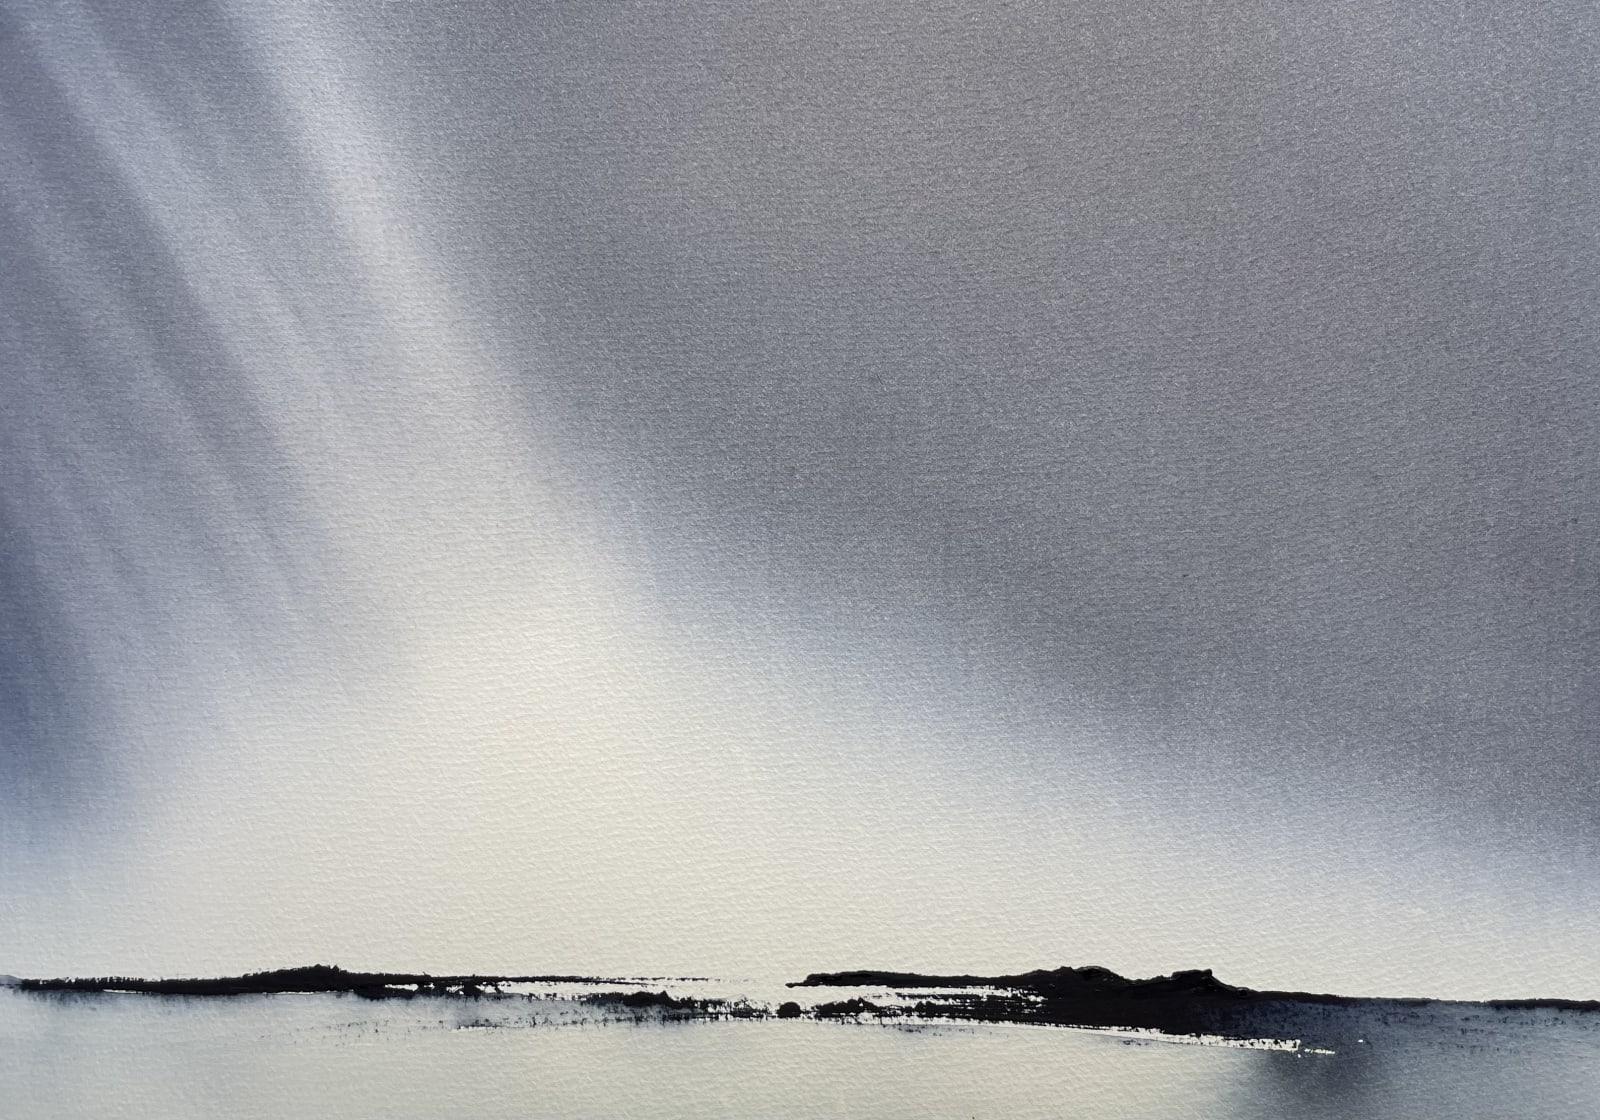 Stephen Redpath, Northern Light, 2021